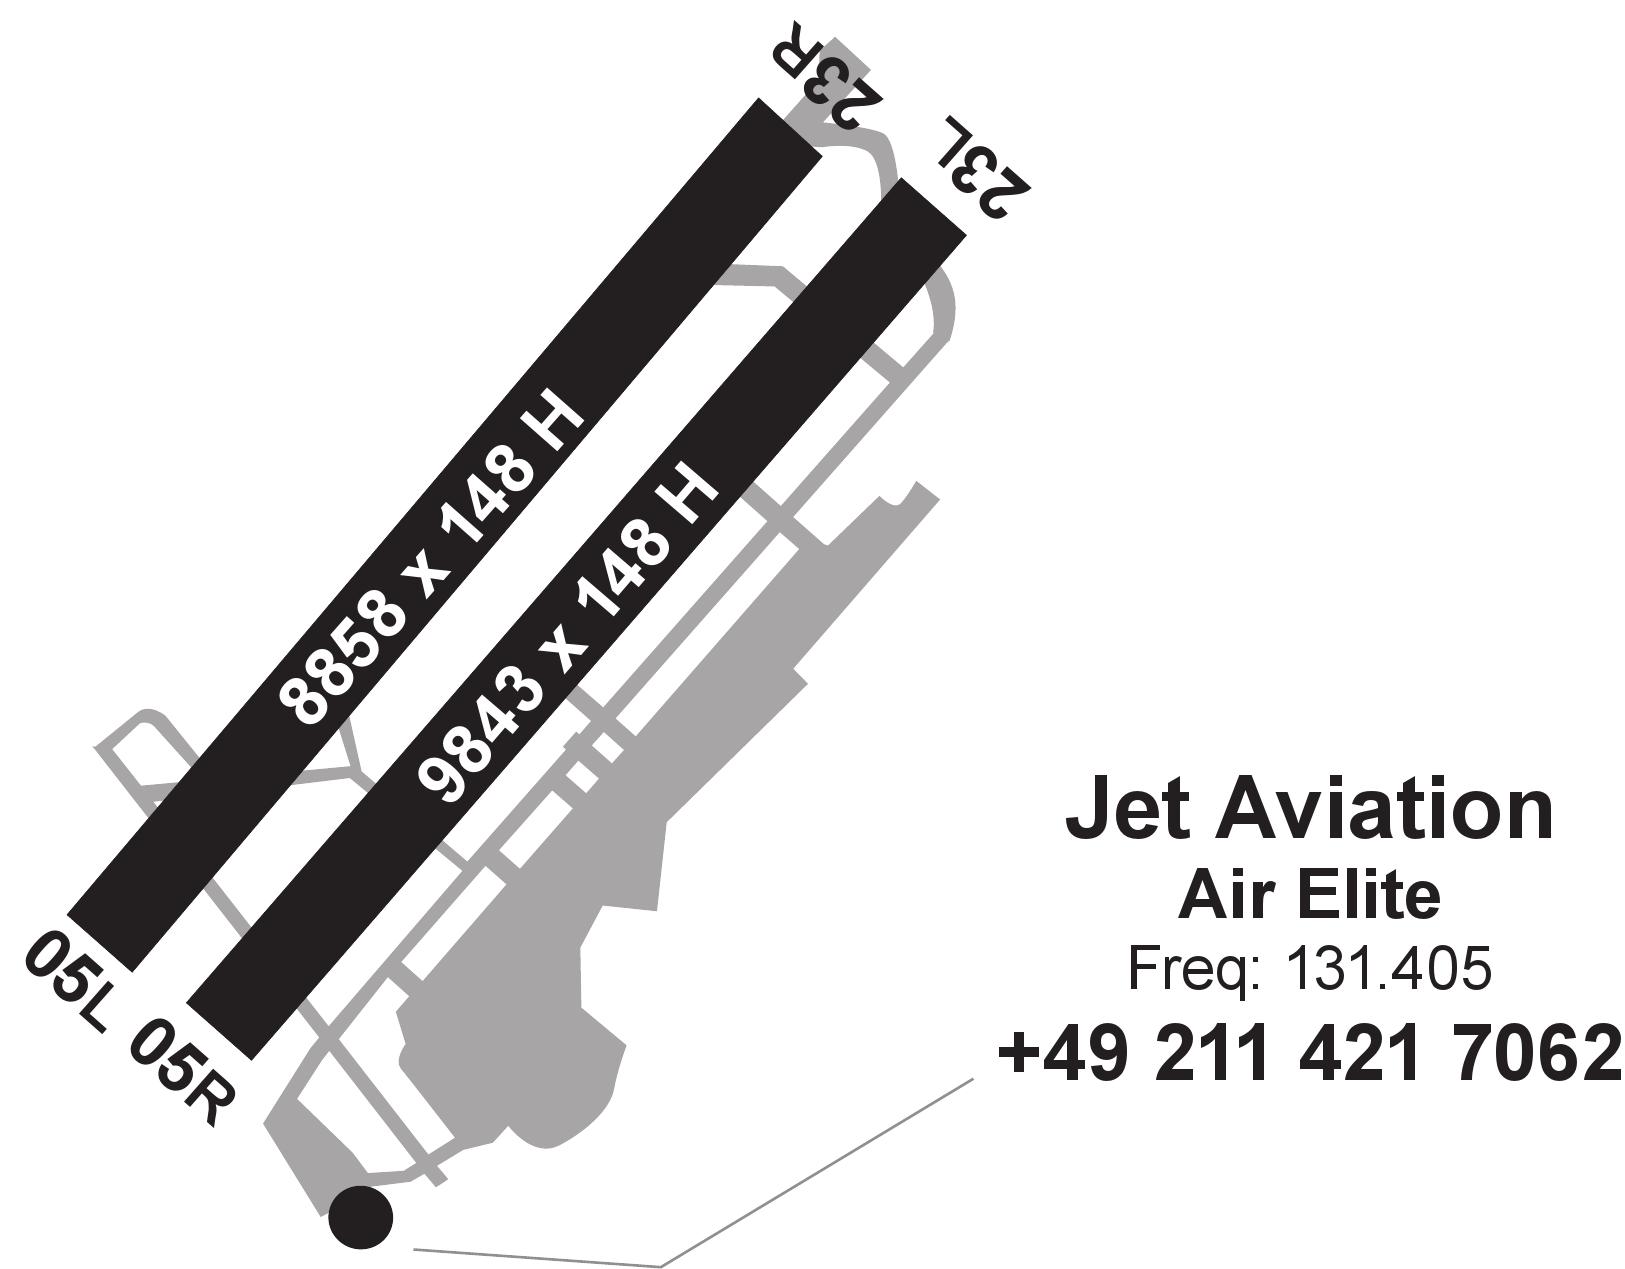 Jet Aviation Services Gmbh